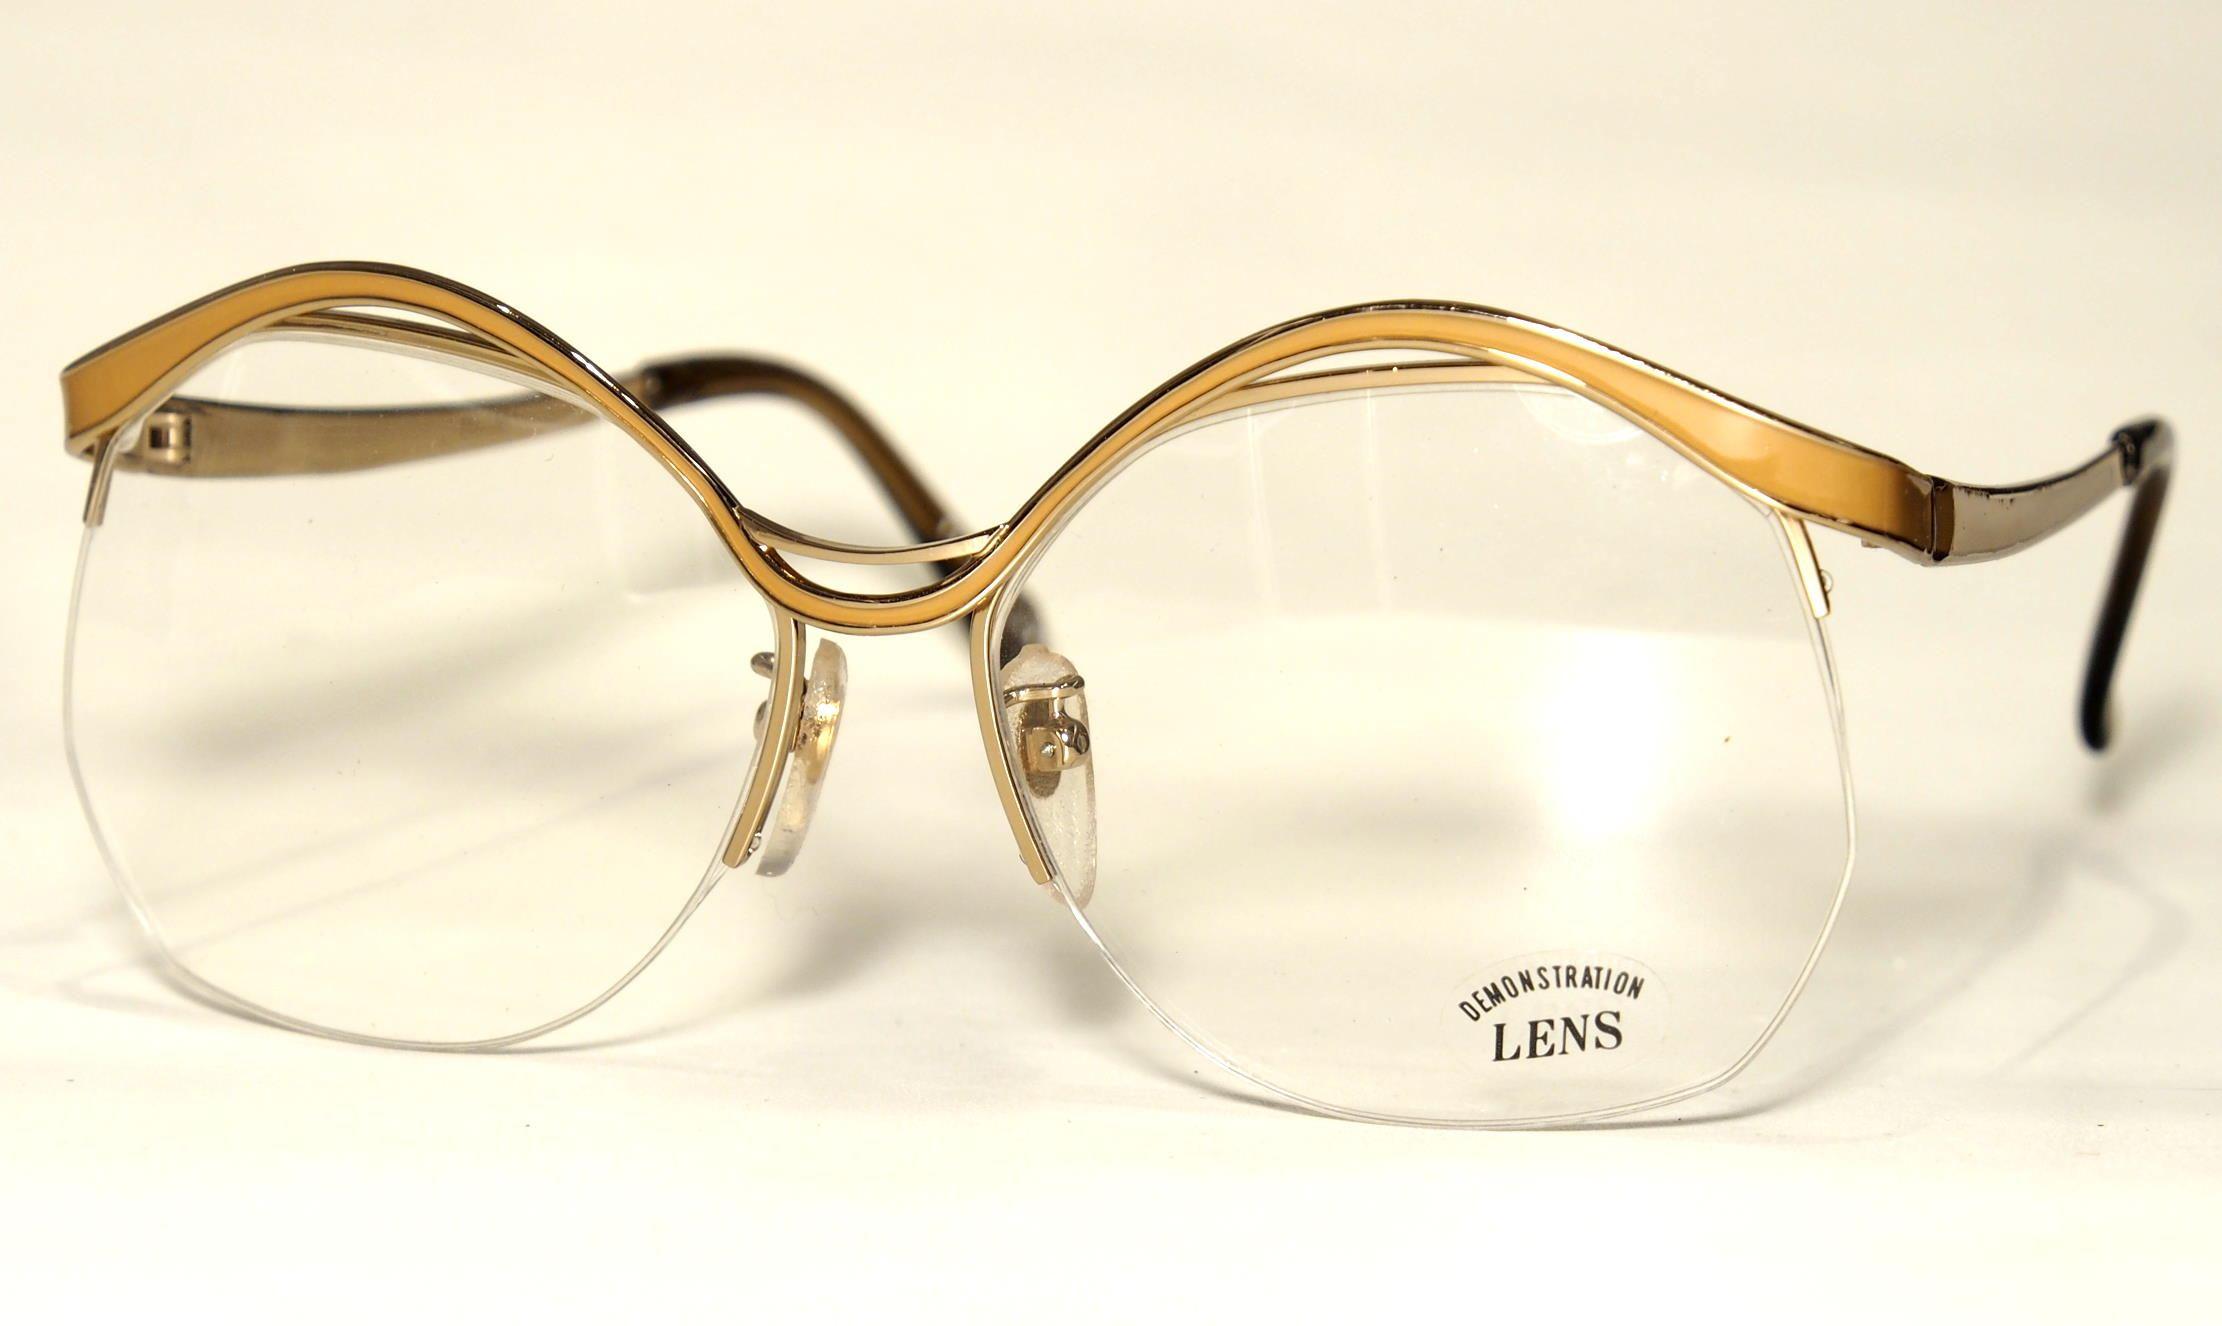 Selecta New York Vintagebrille Modell Linda